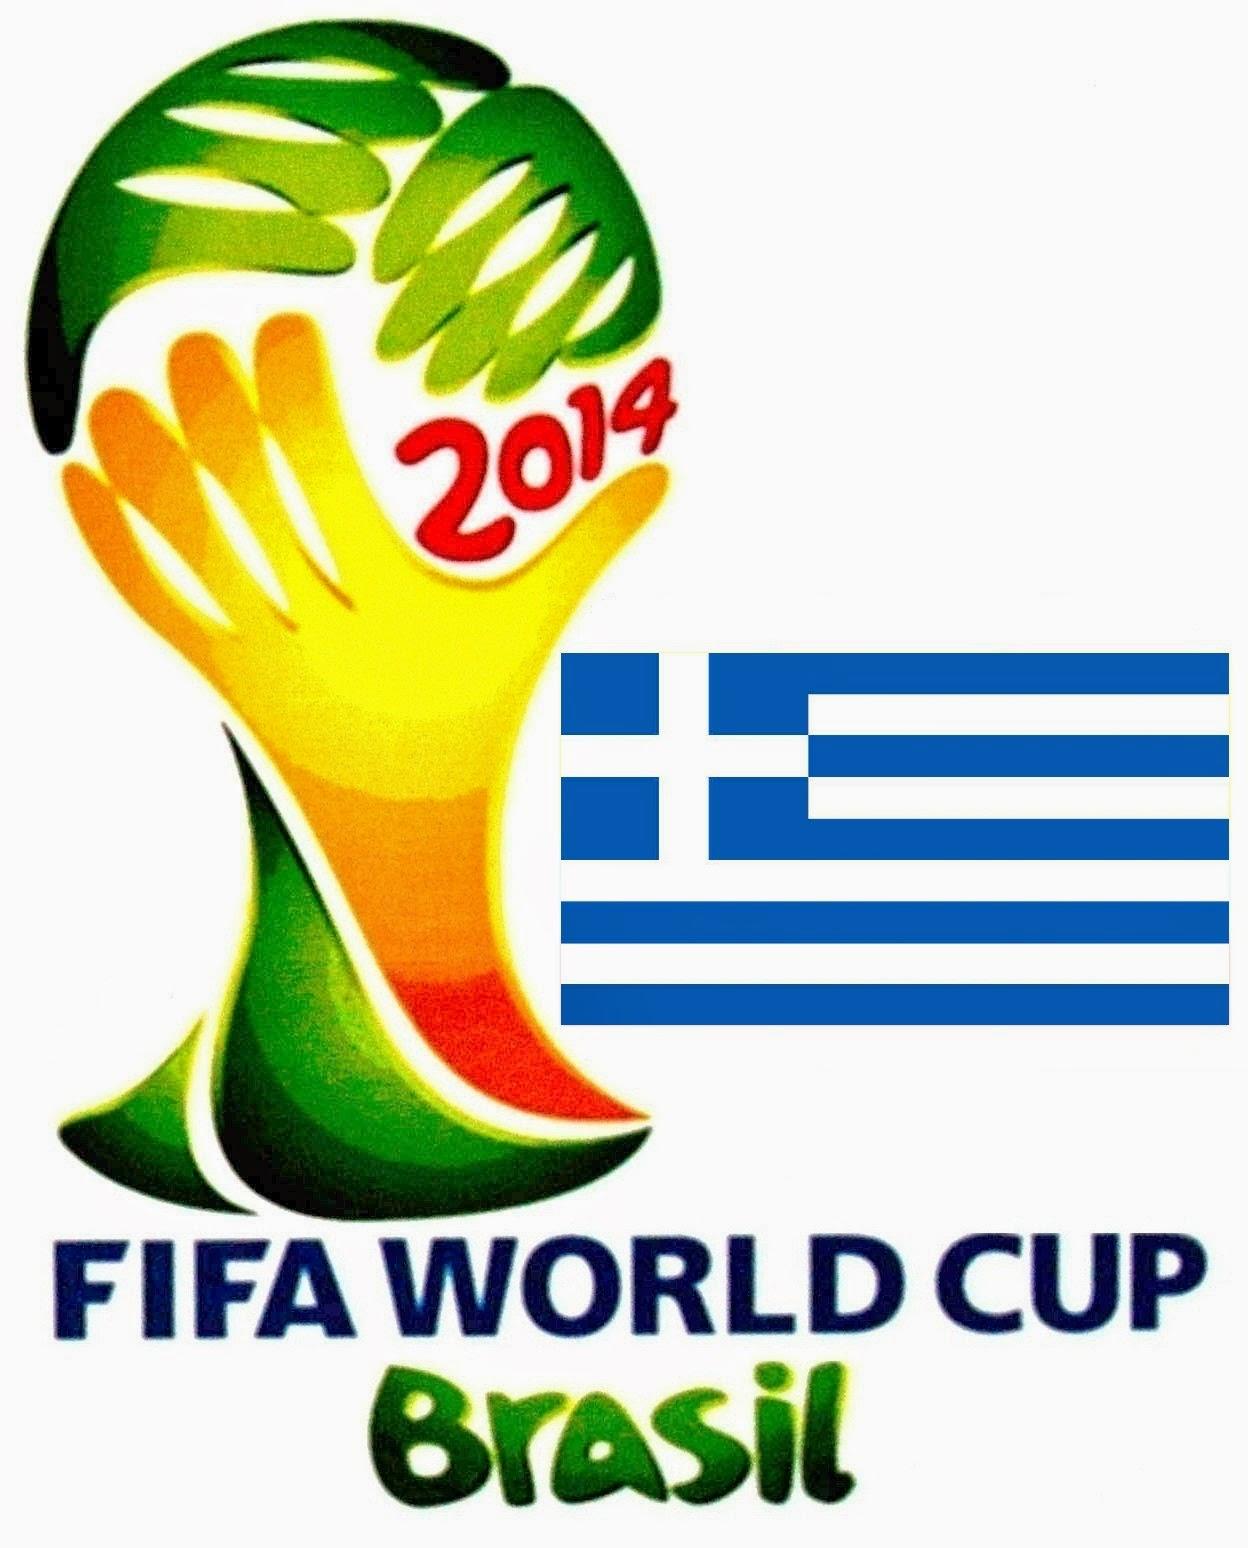 Daftar Nama Pemain Timnas Yunani Piala Dunia 2014